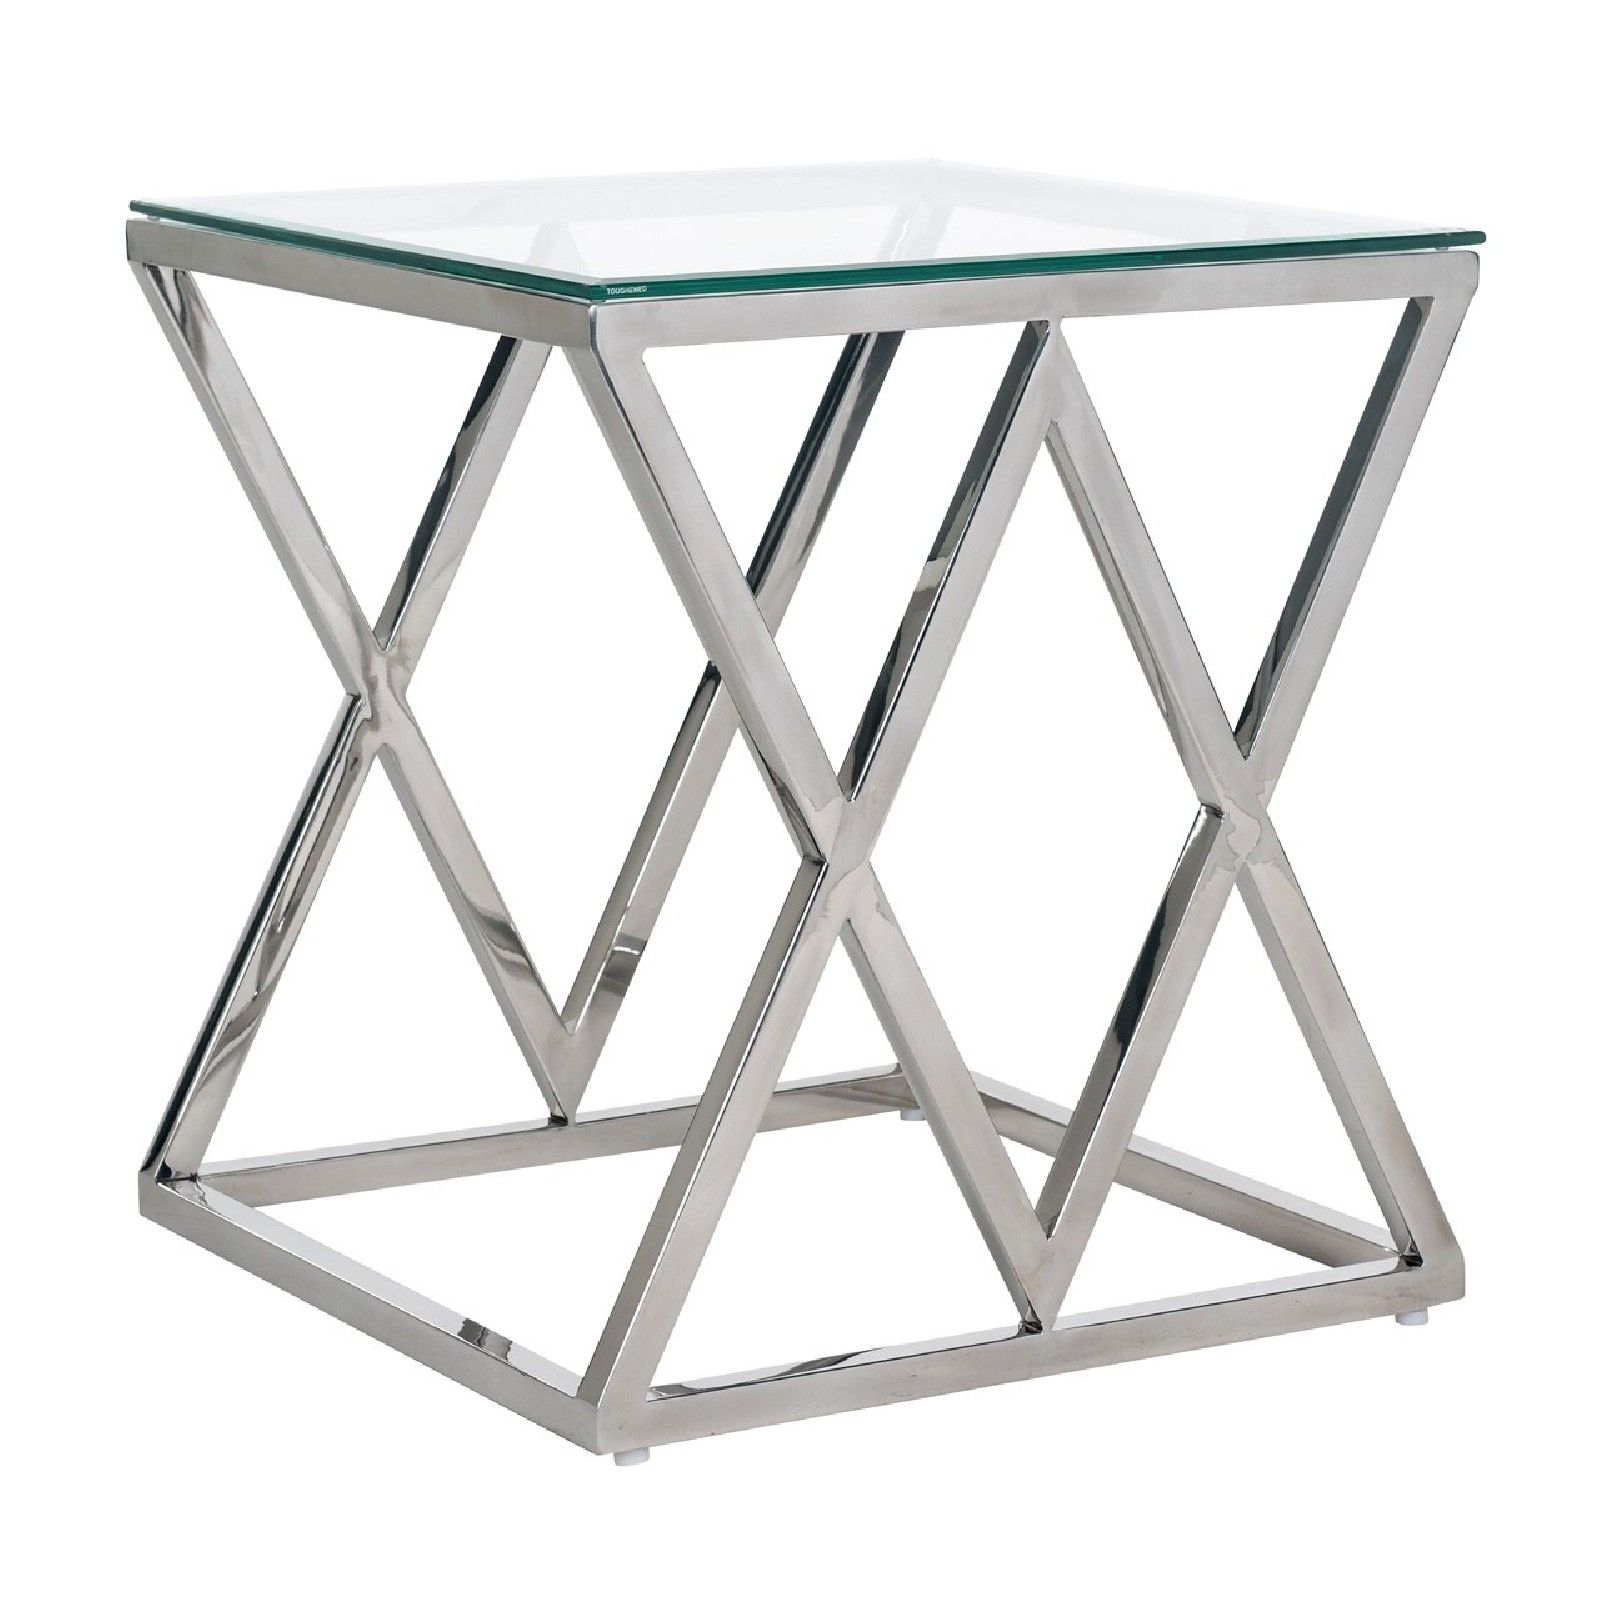 Table Paramount Meuble Déco Tendance - 15